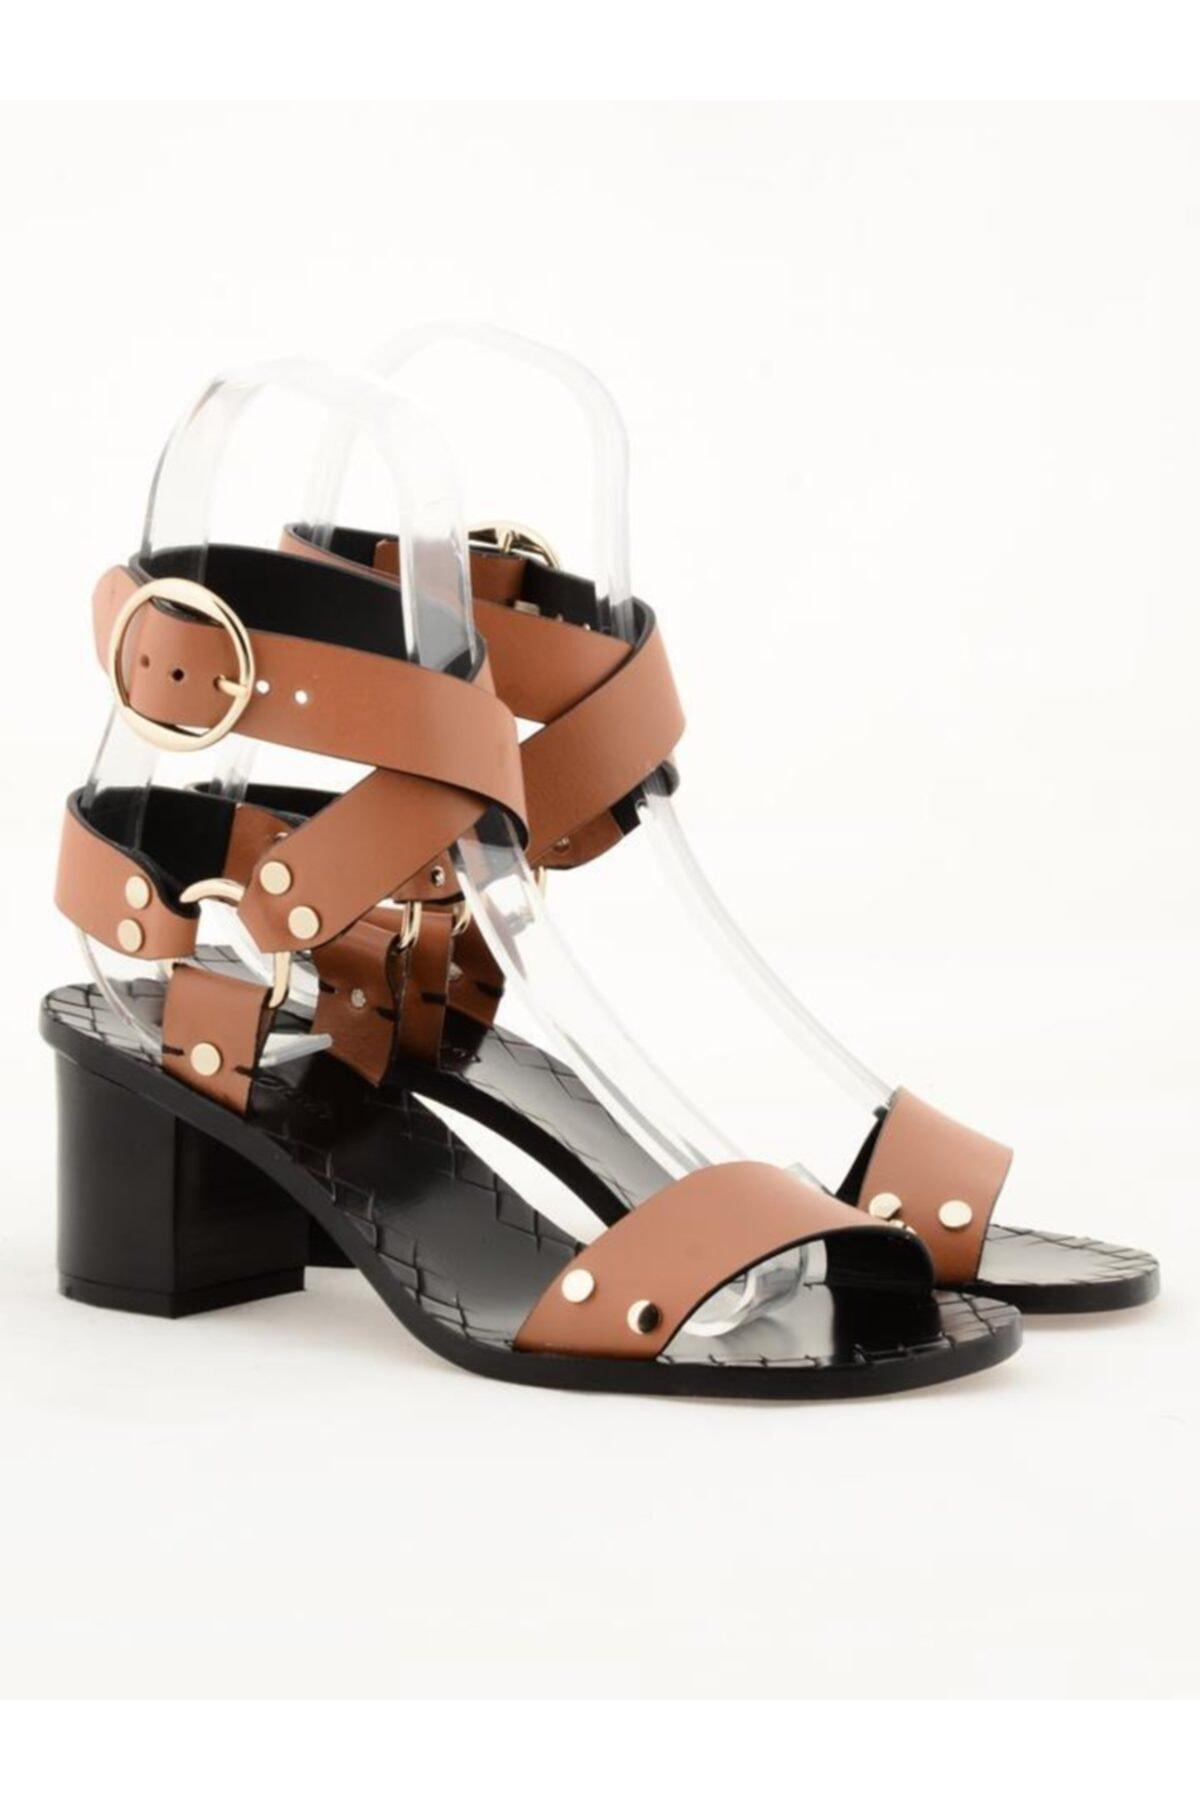 Nursace Hakiki Deri Klasik Topuklu Ayakkabı Nsc19y-a57506 Quetto 1